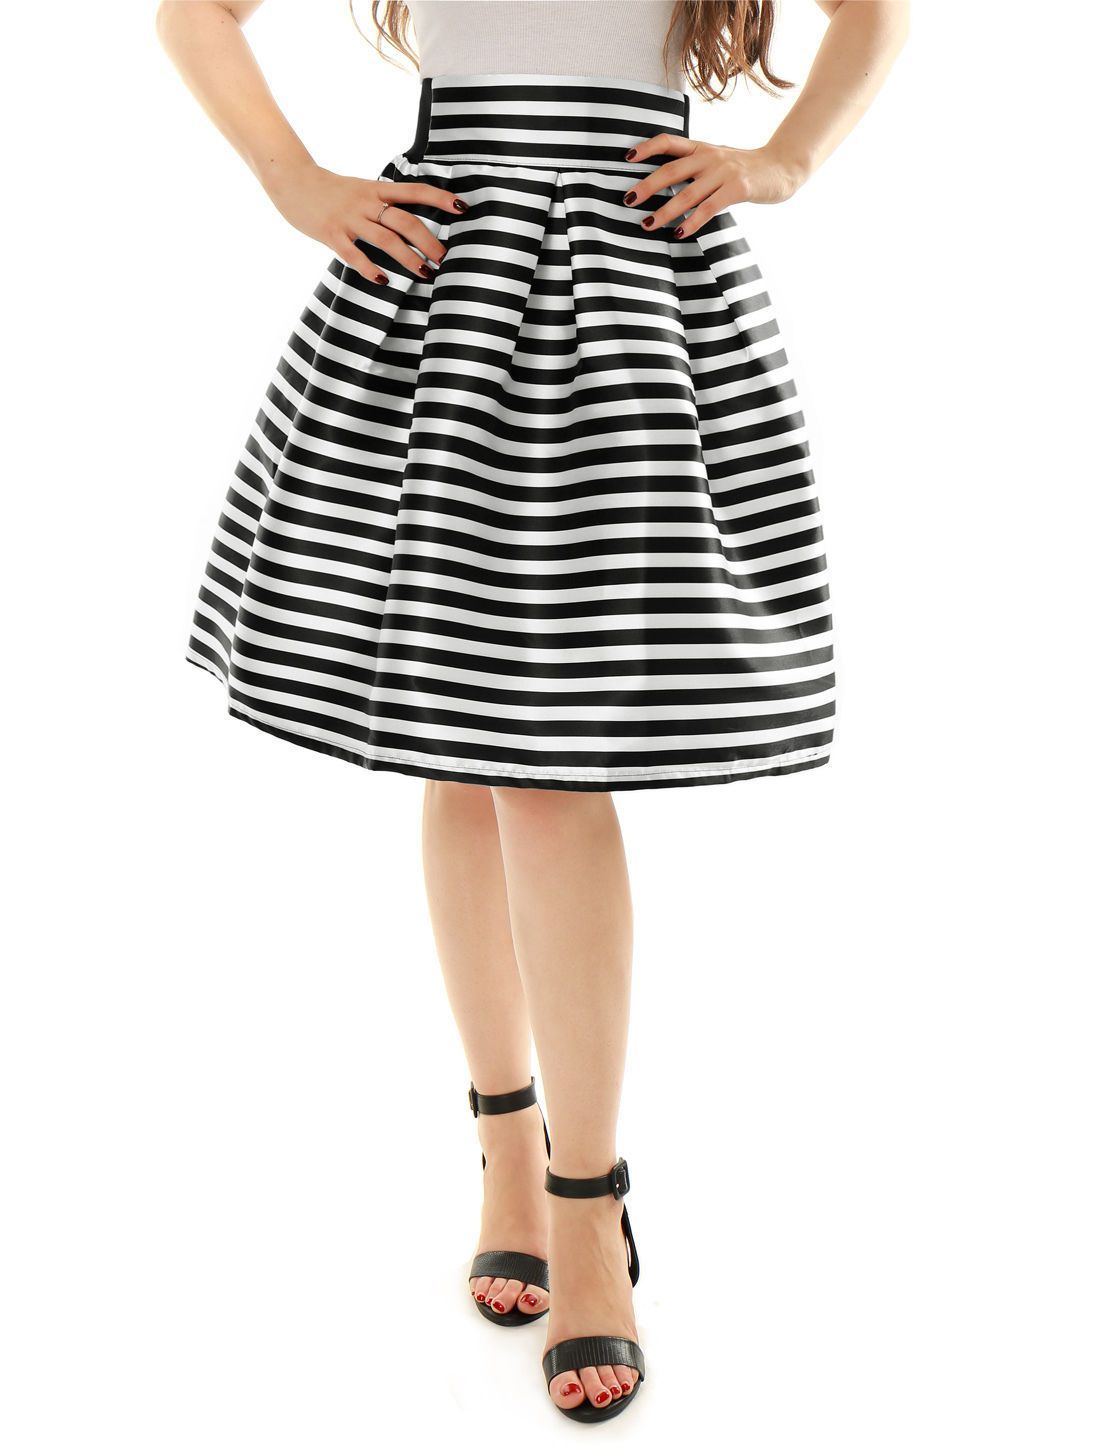 Allegra K Women Striped High Waist Pleated Knee Length A-Line Skirt ... 1aad7bc4a